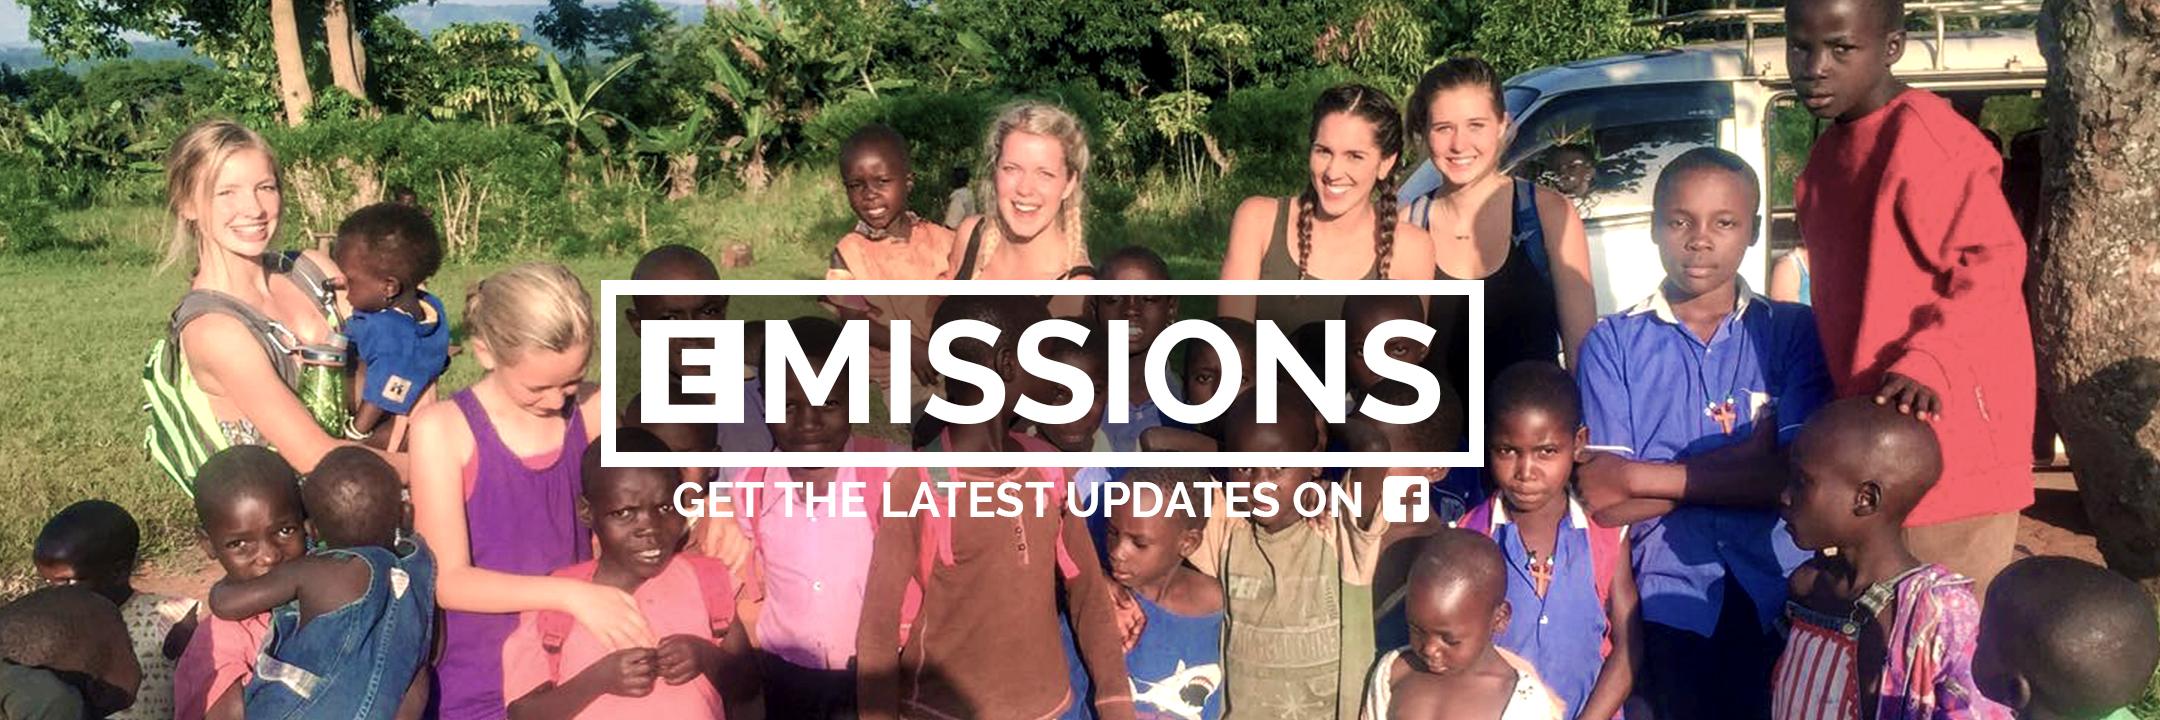 Edgewater Christian Fellowship, Folkestads in Uganda, MIssions, ECF Missions